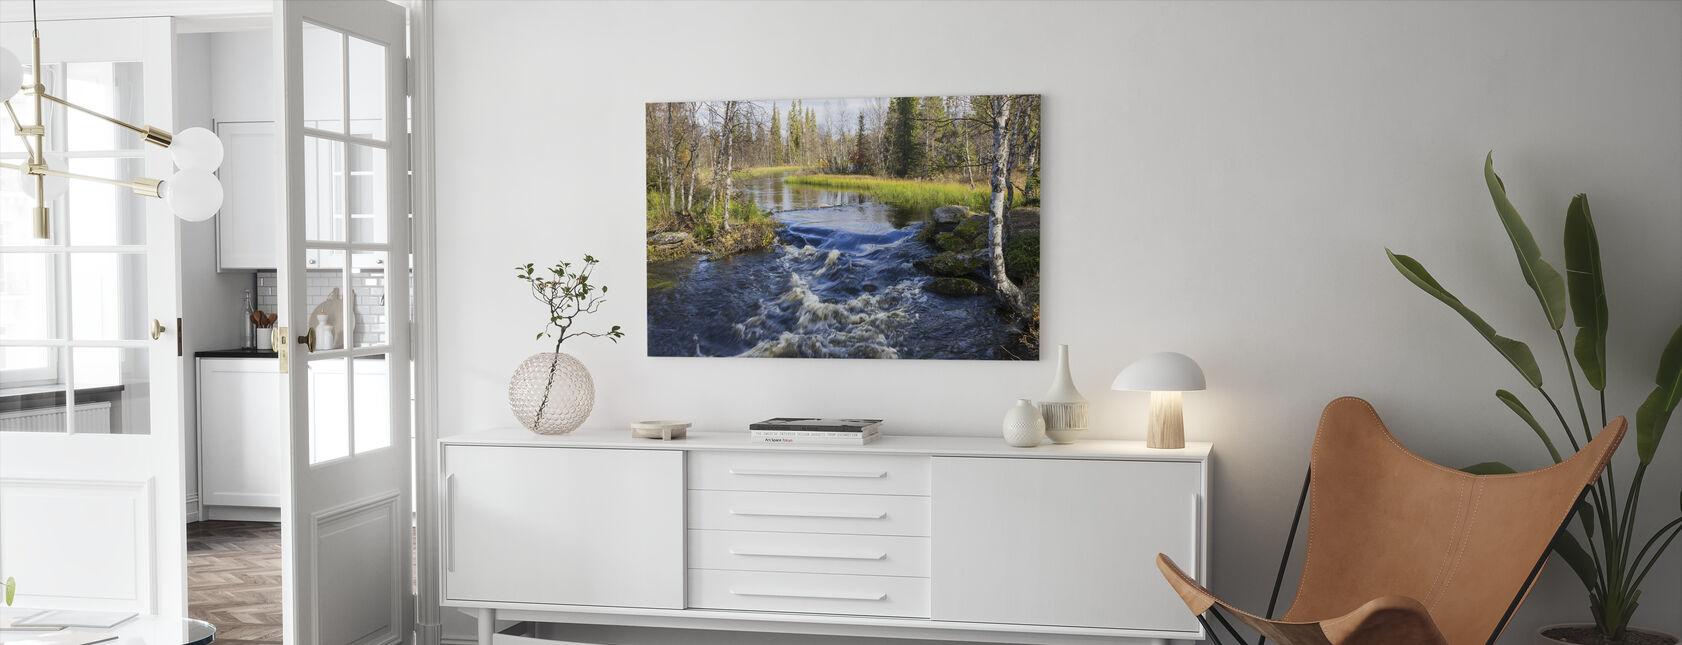 Lappland River - Lerretsbilde - Stue